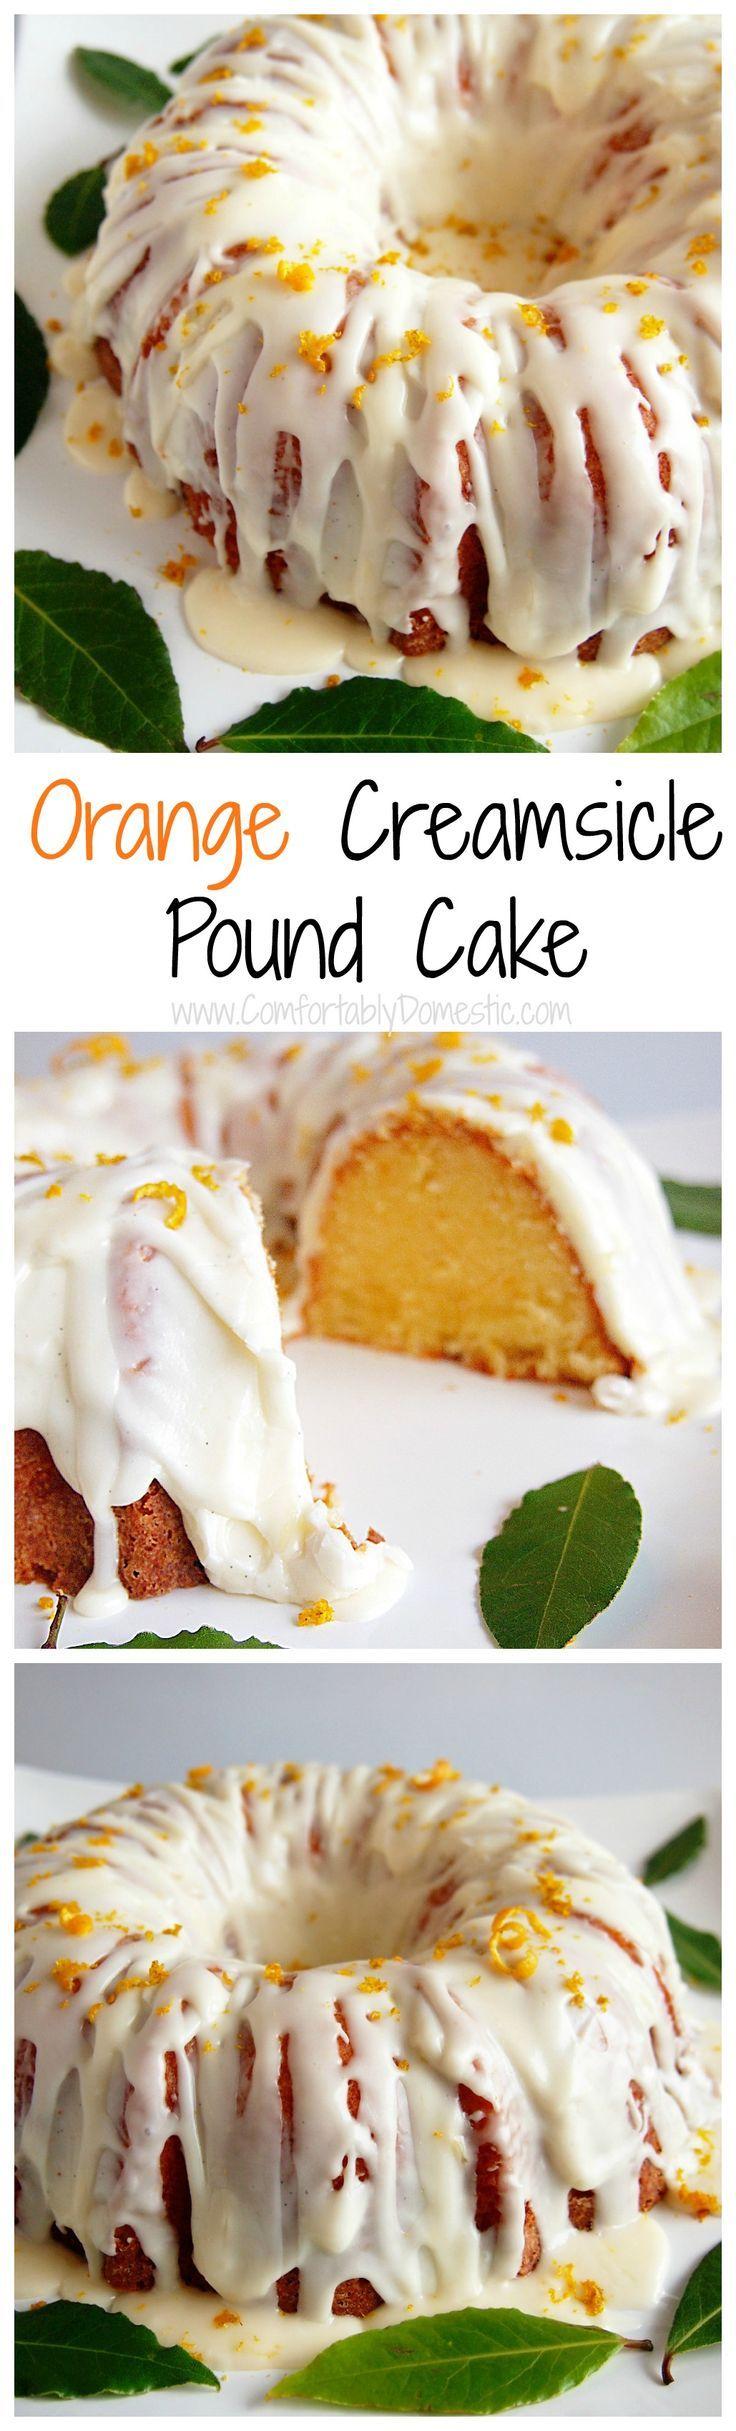 Orange Creamsicle Pound Cake marries zesty orange pound cake with creamy vanilla icing for a taste as refreshing as the nostalgic frozen treat. via /comfortdomestic/